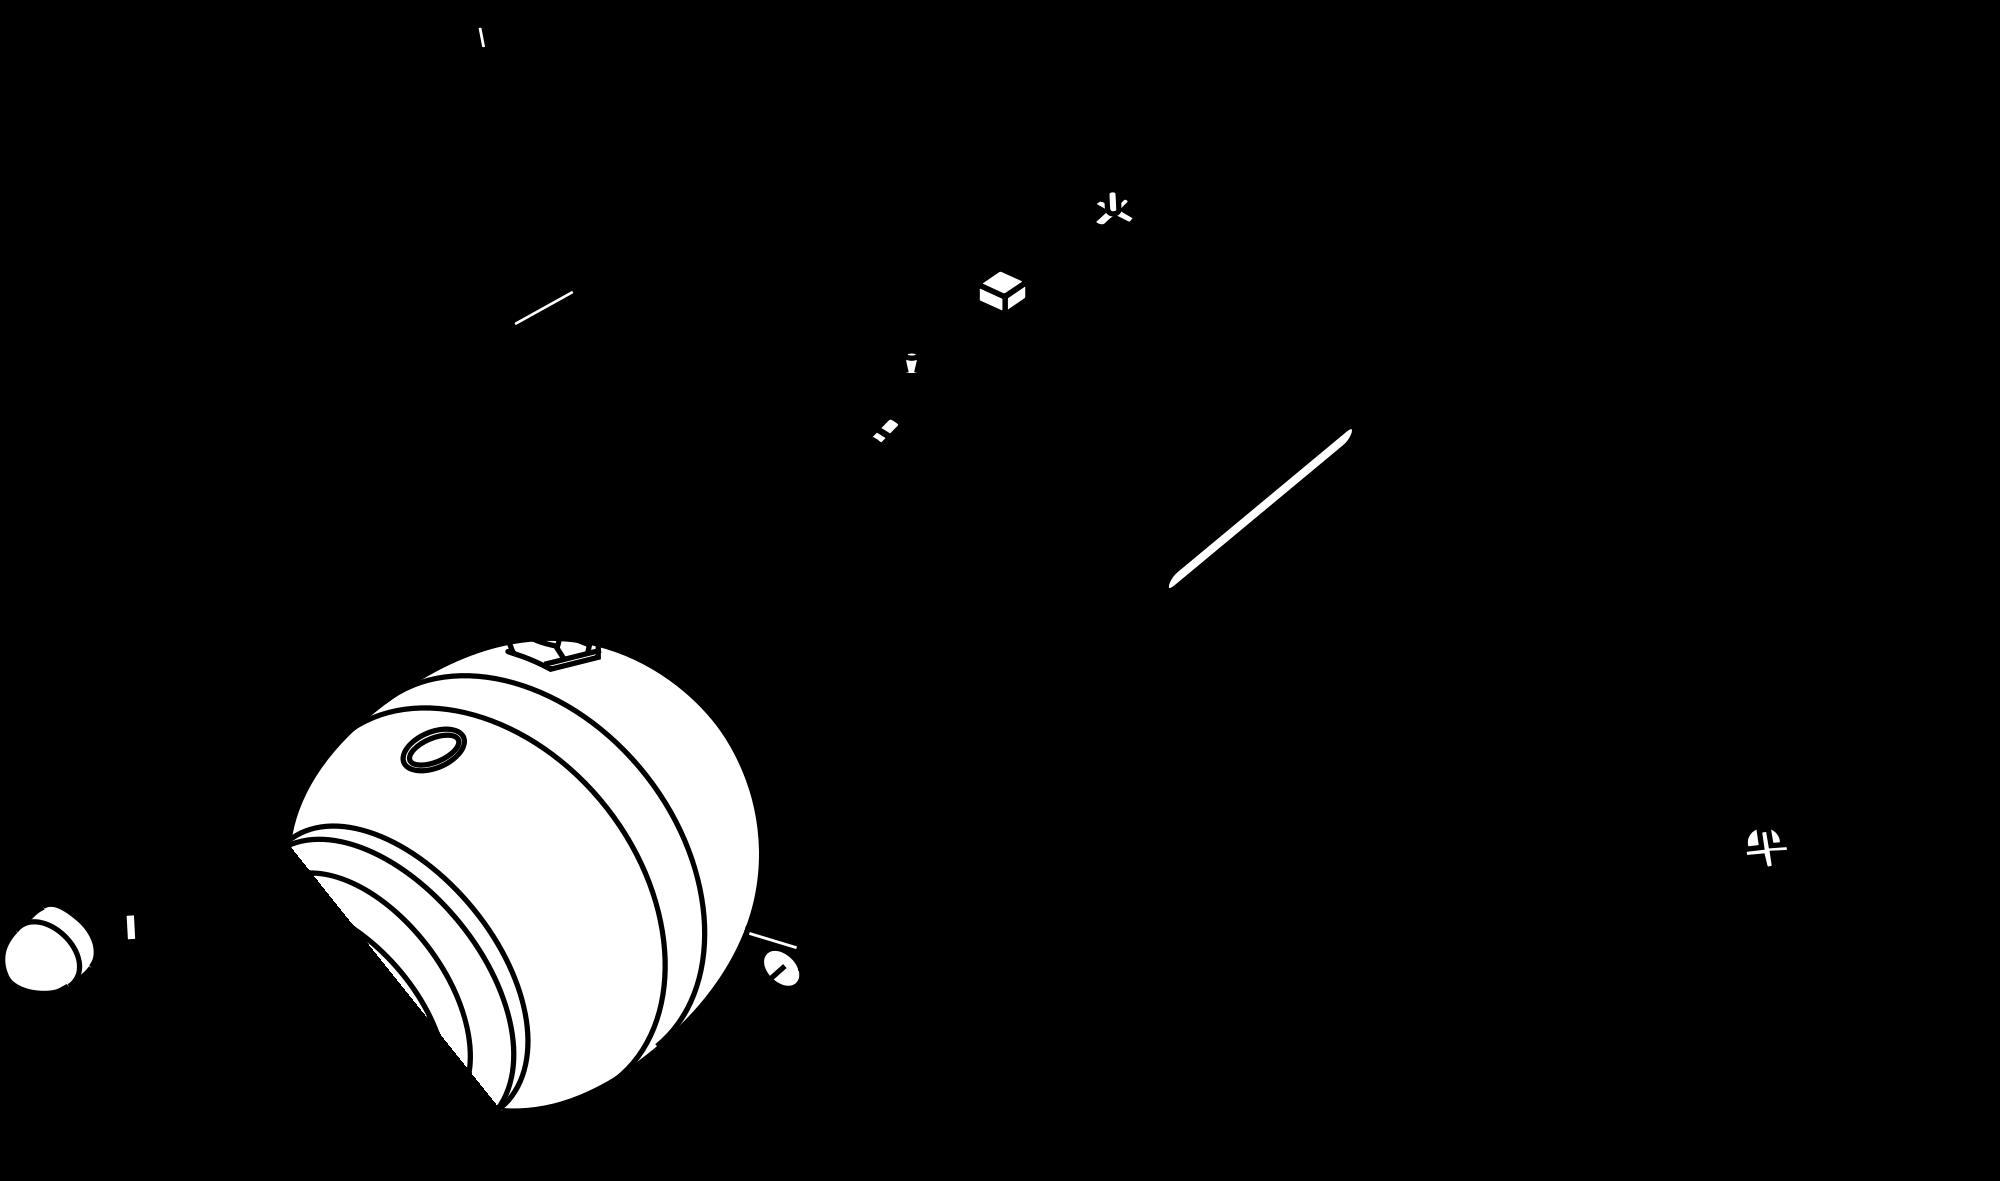 2000x1181 Filesoyuz T Drawing.svg